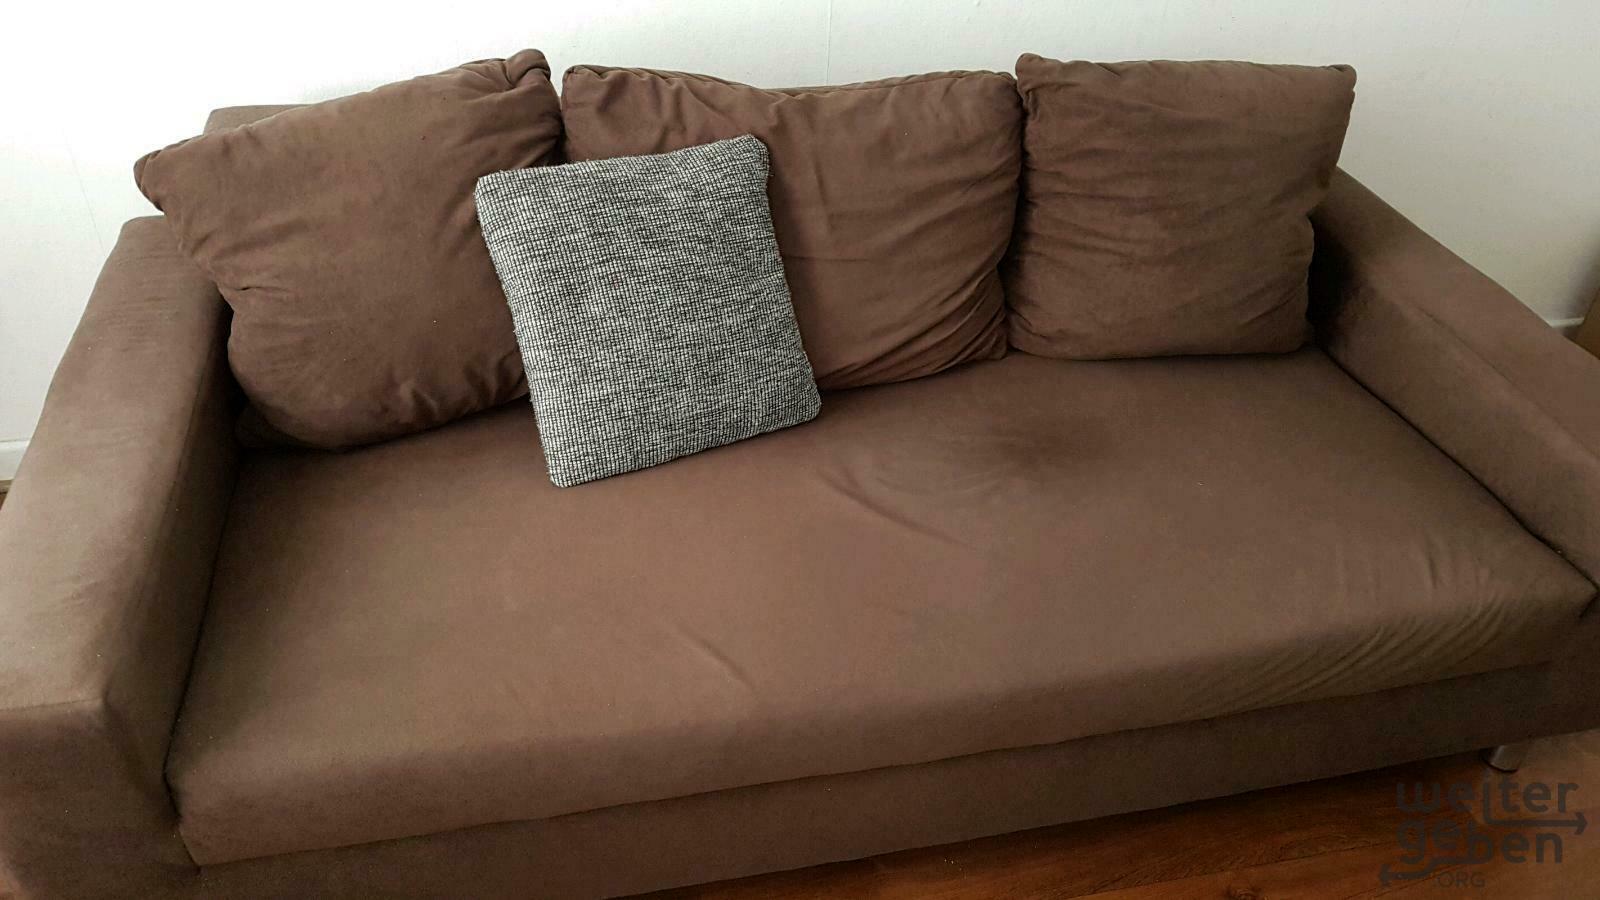 Sofa in Hamm